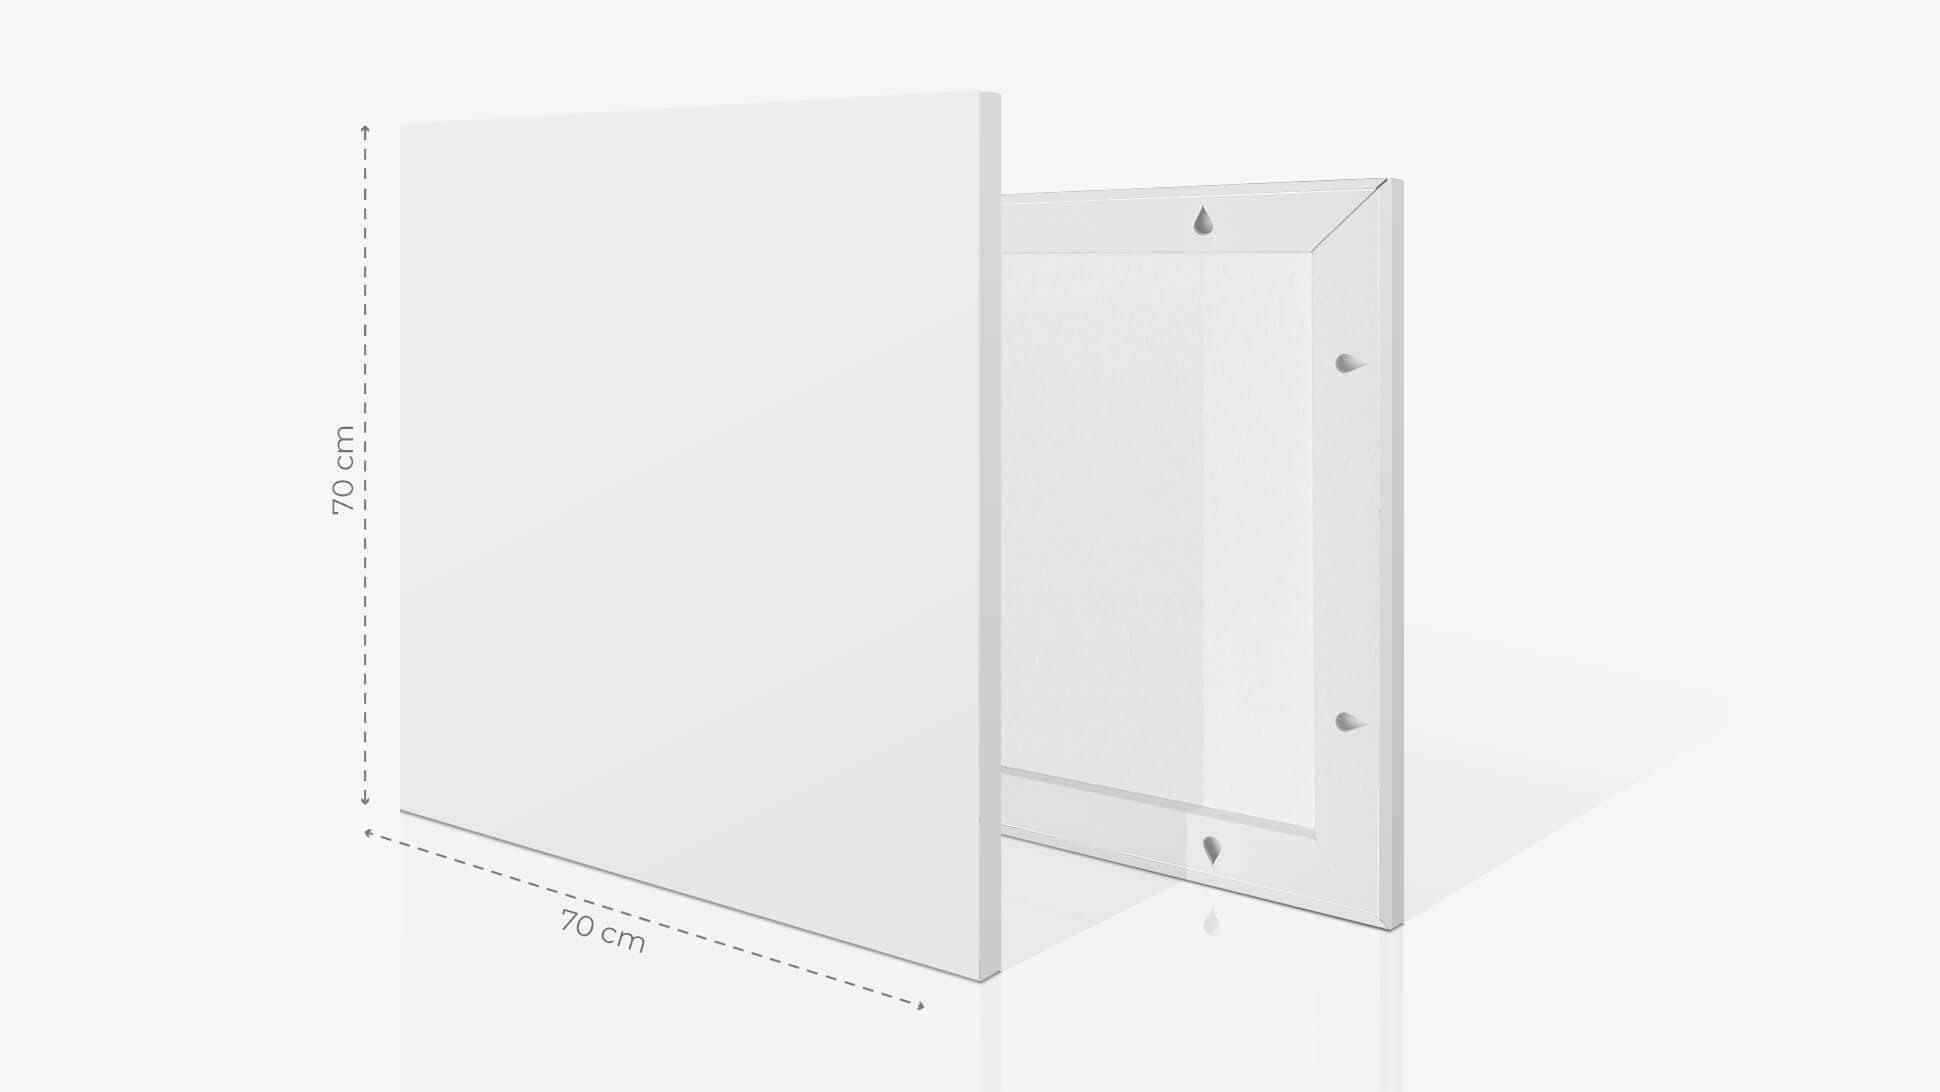 Fotoquadro 70x70 cm | tictac.it